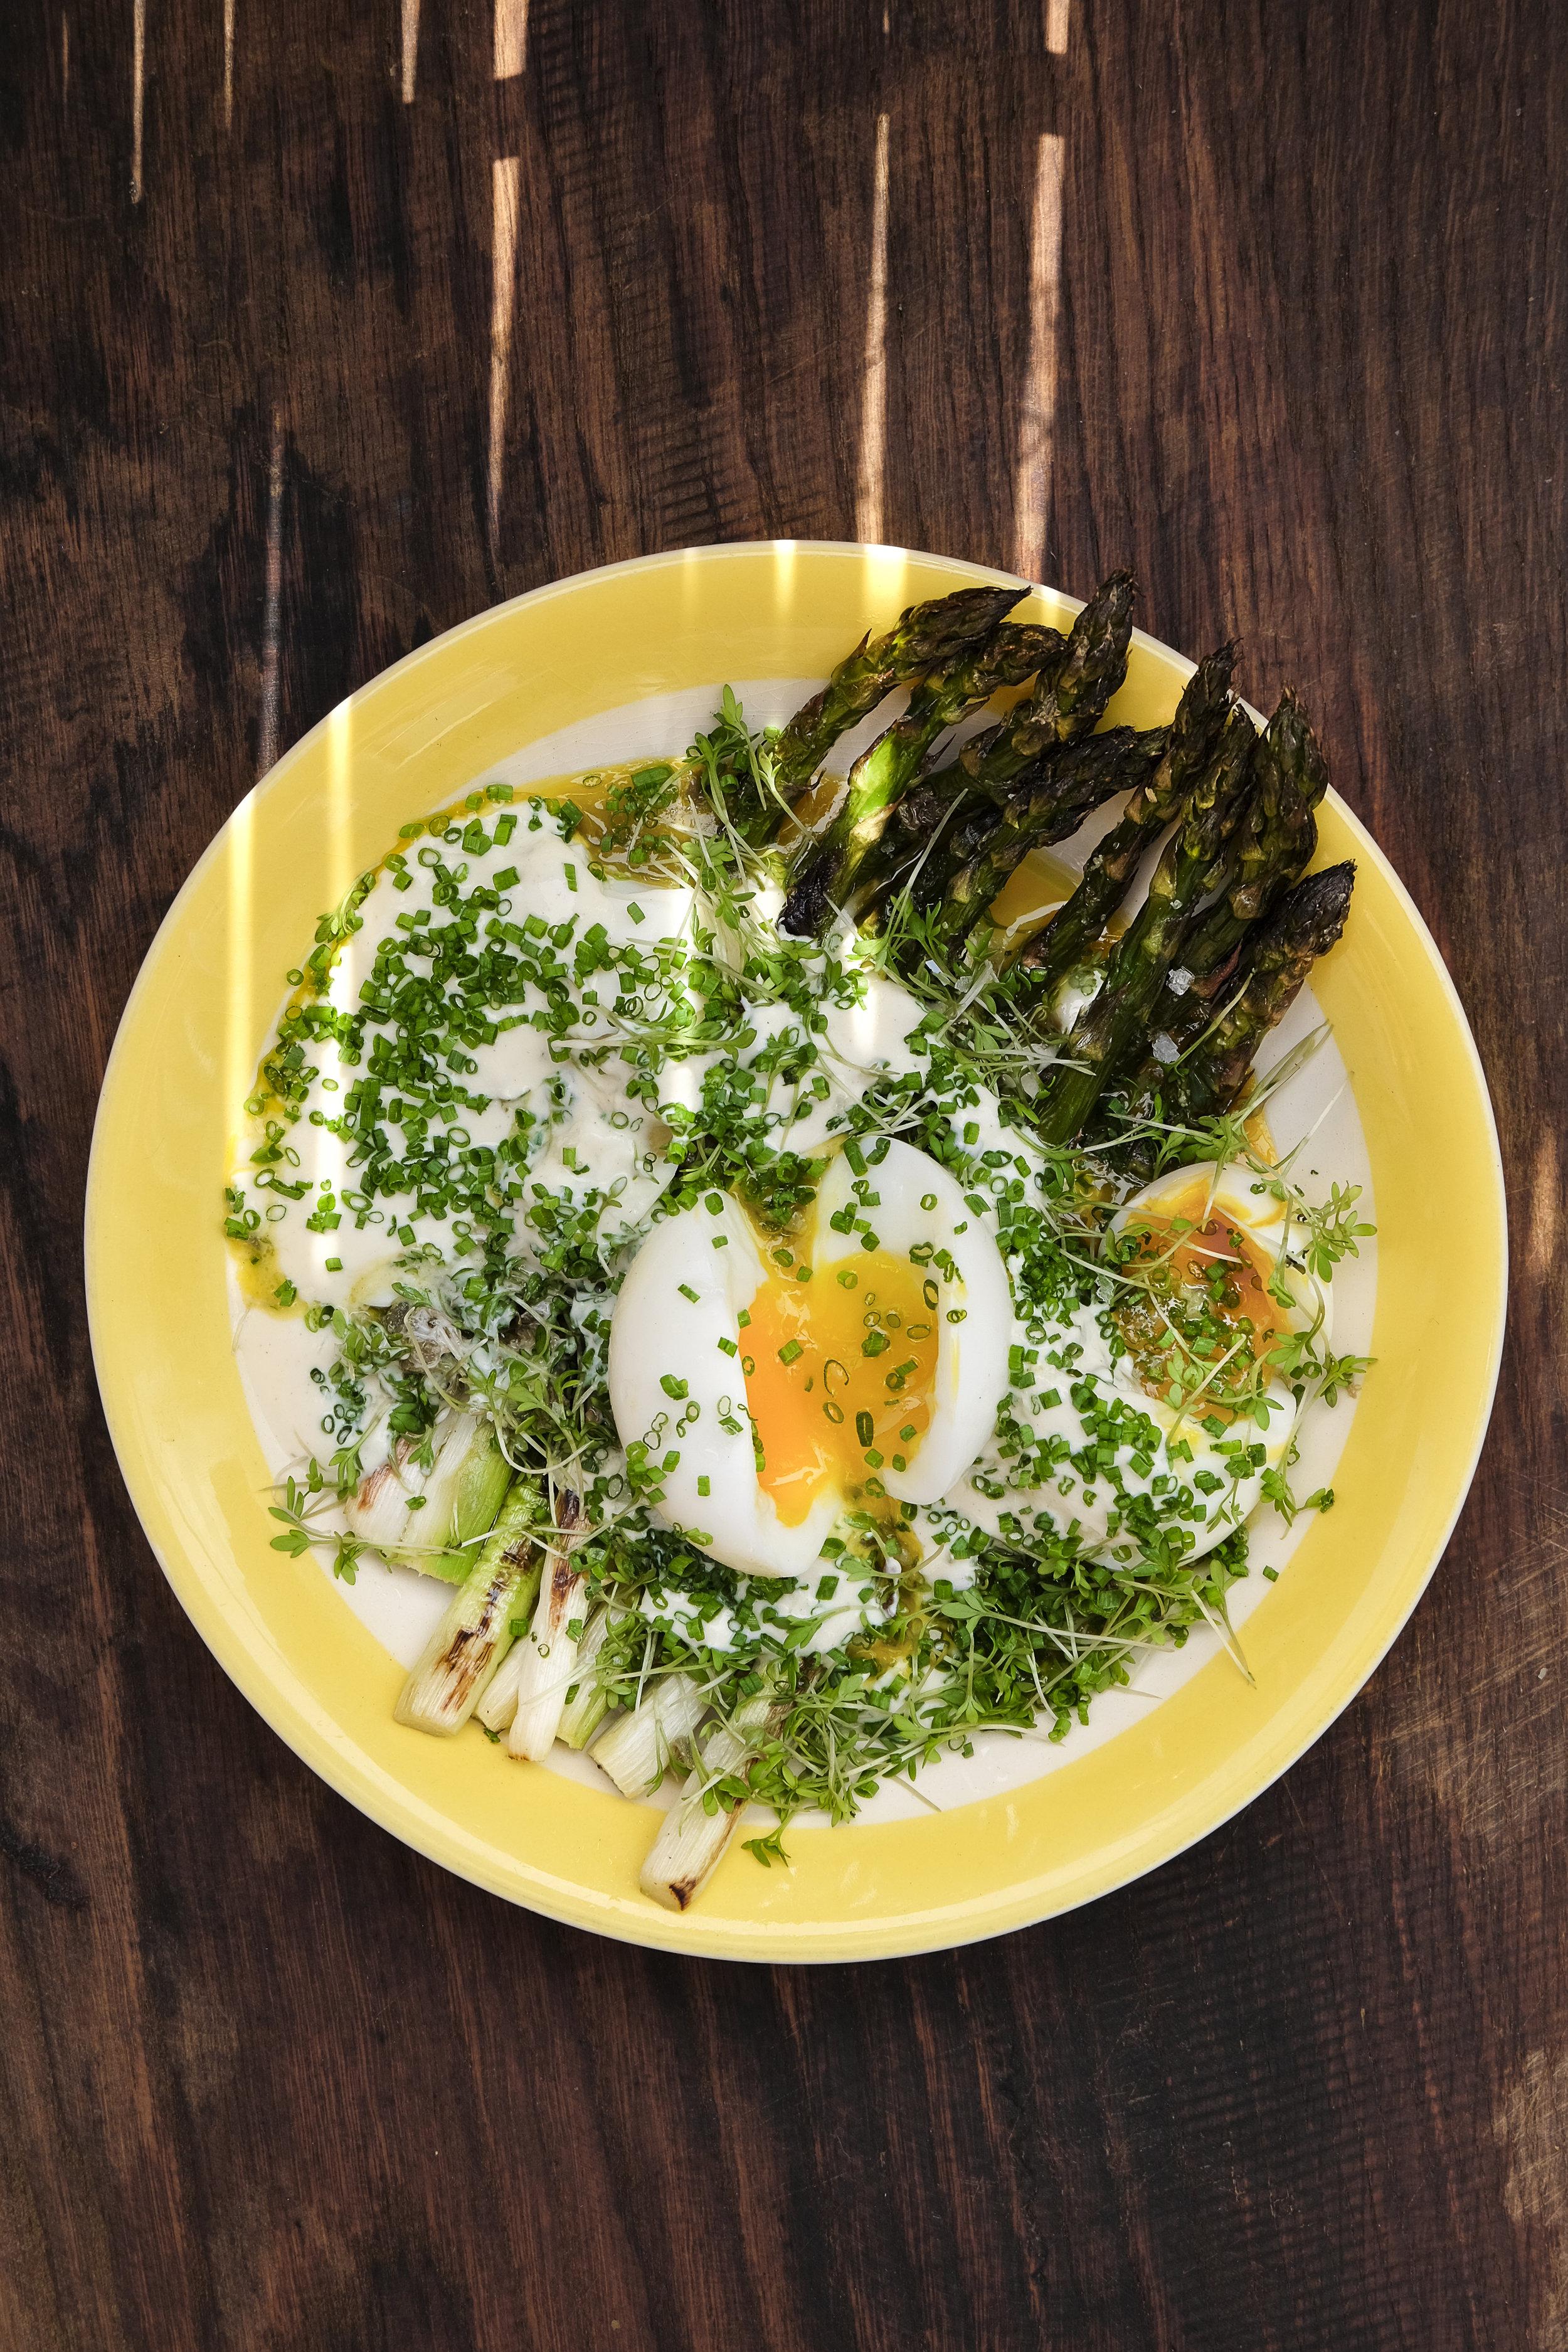 Groene asperges met zachtgekookte eieren, kappertjes en mosterdsaus 2.jpg